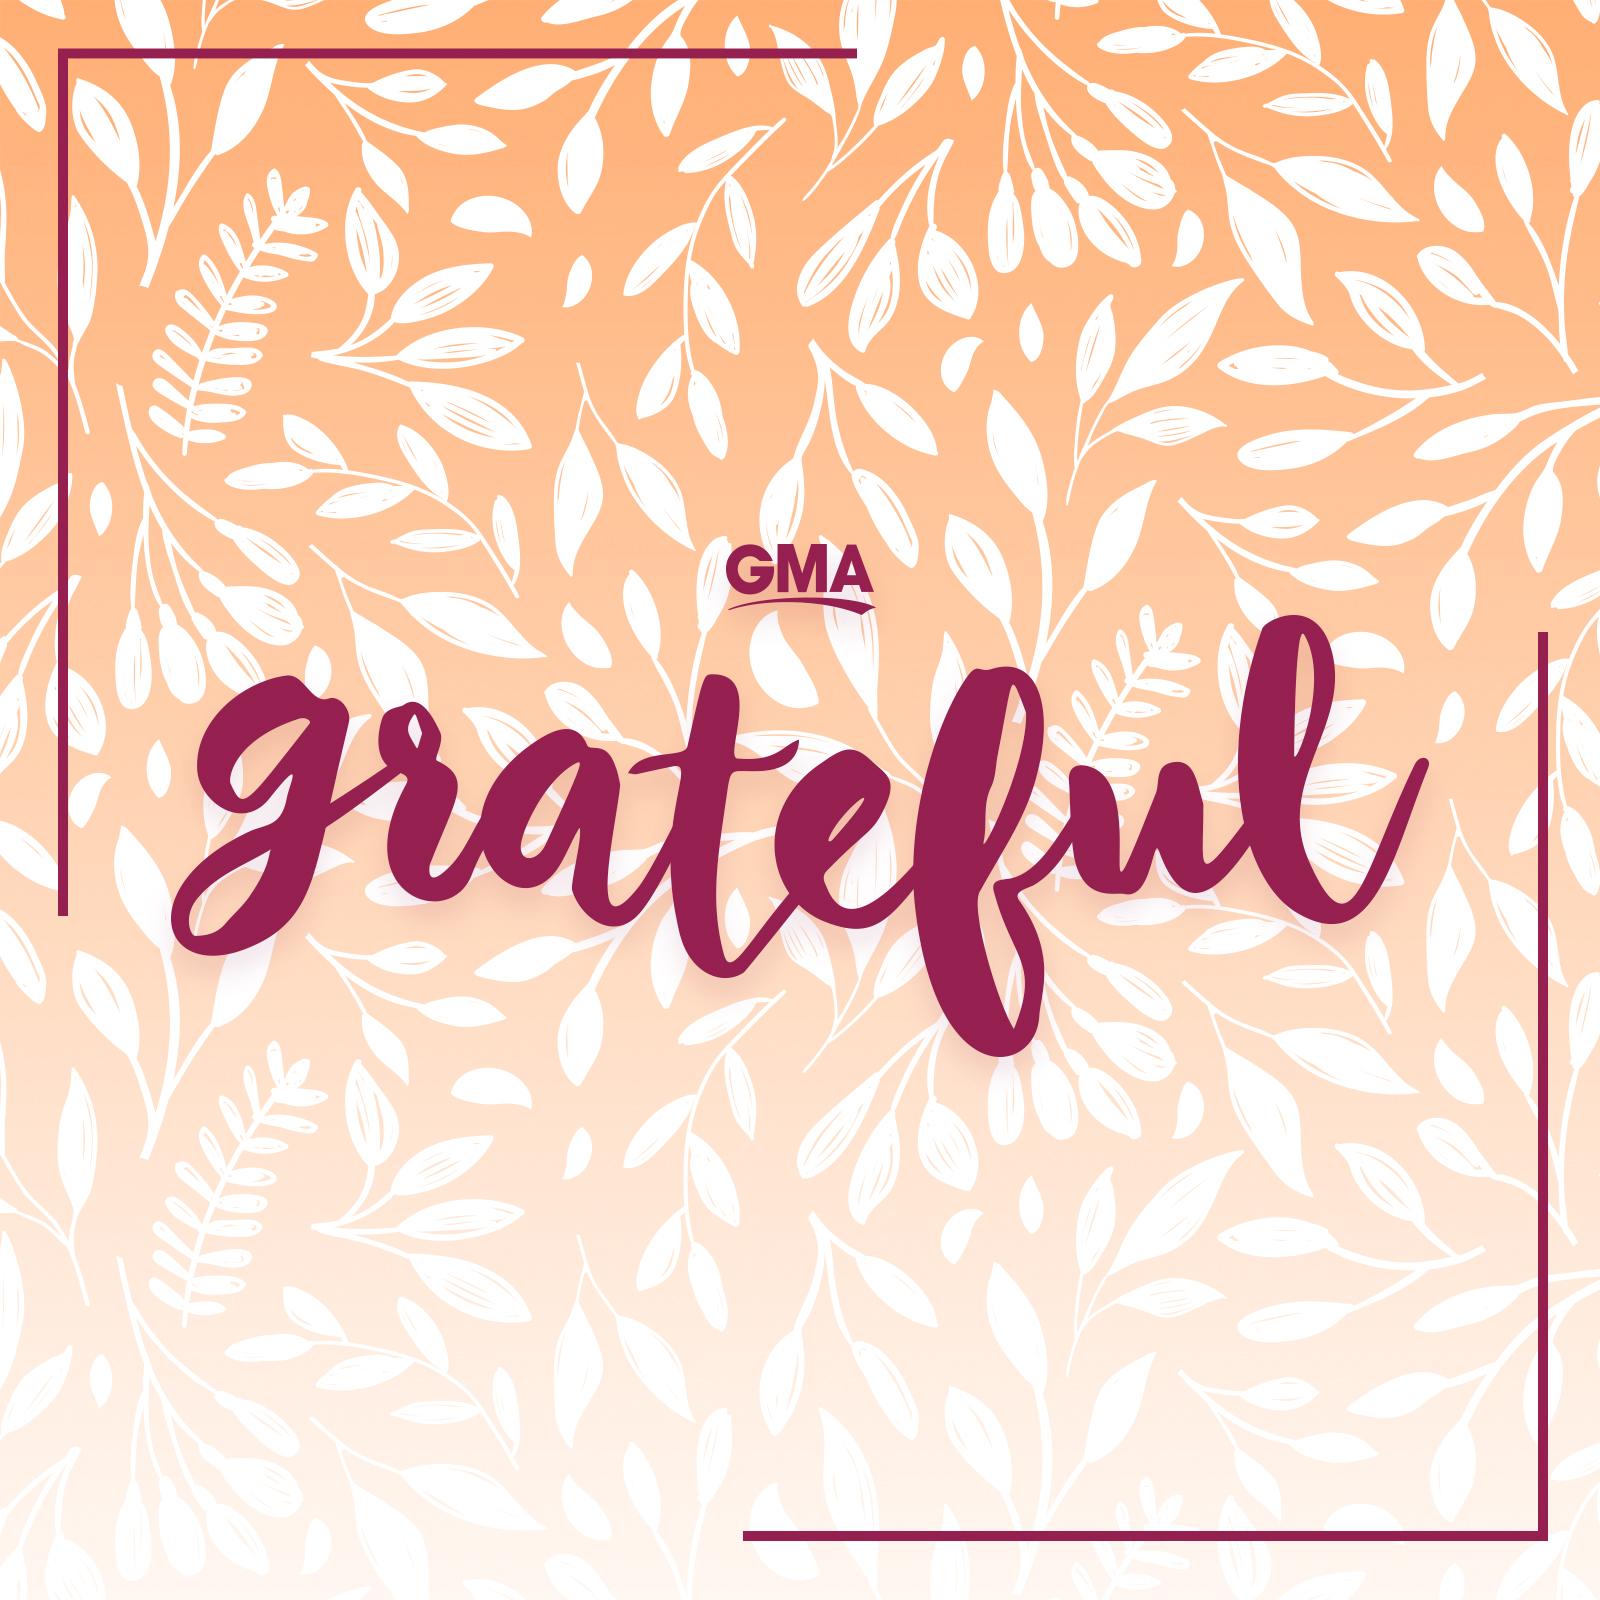 Gma Grateful